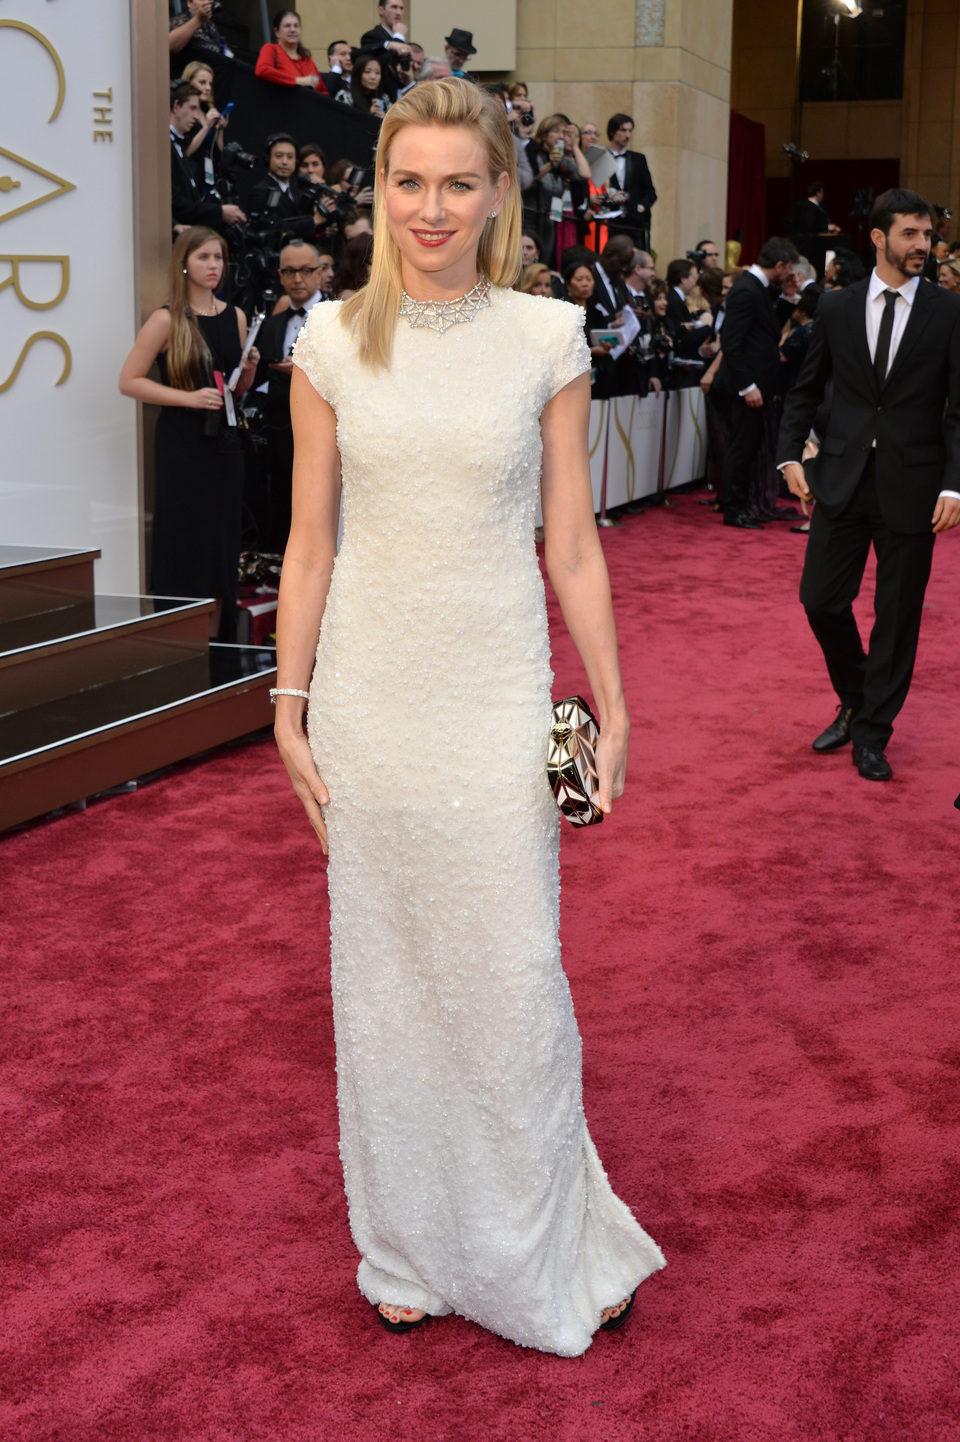 Naomi Watts at the 2014 Oscars